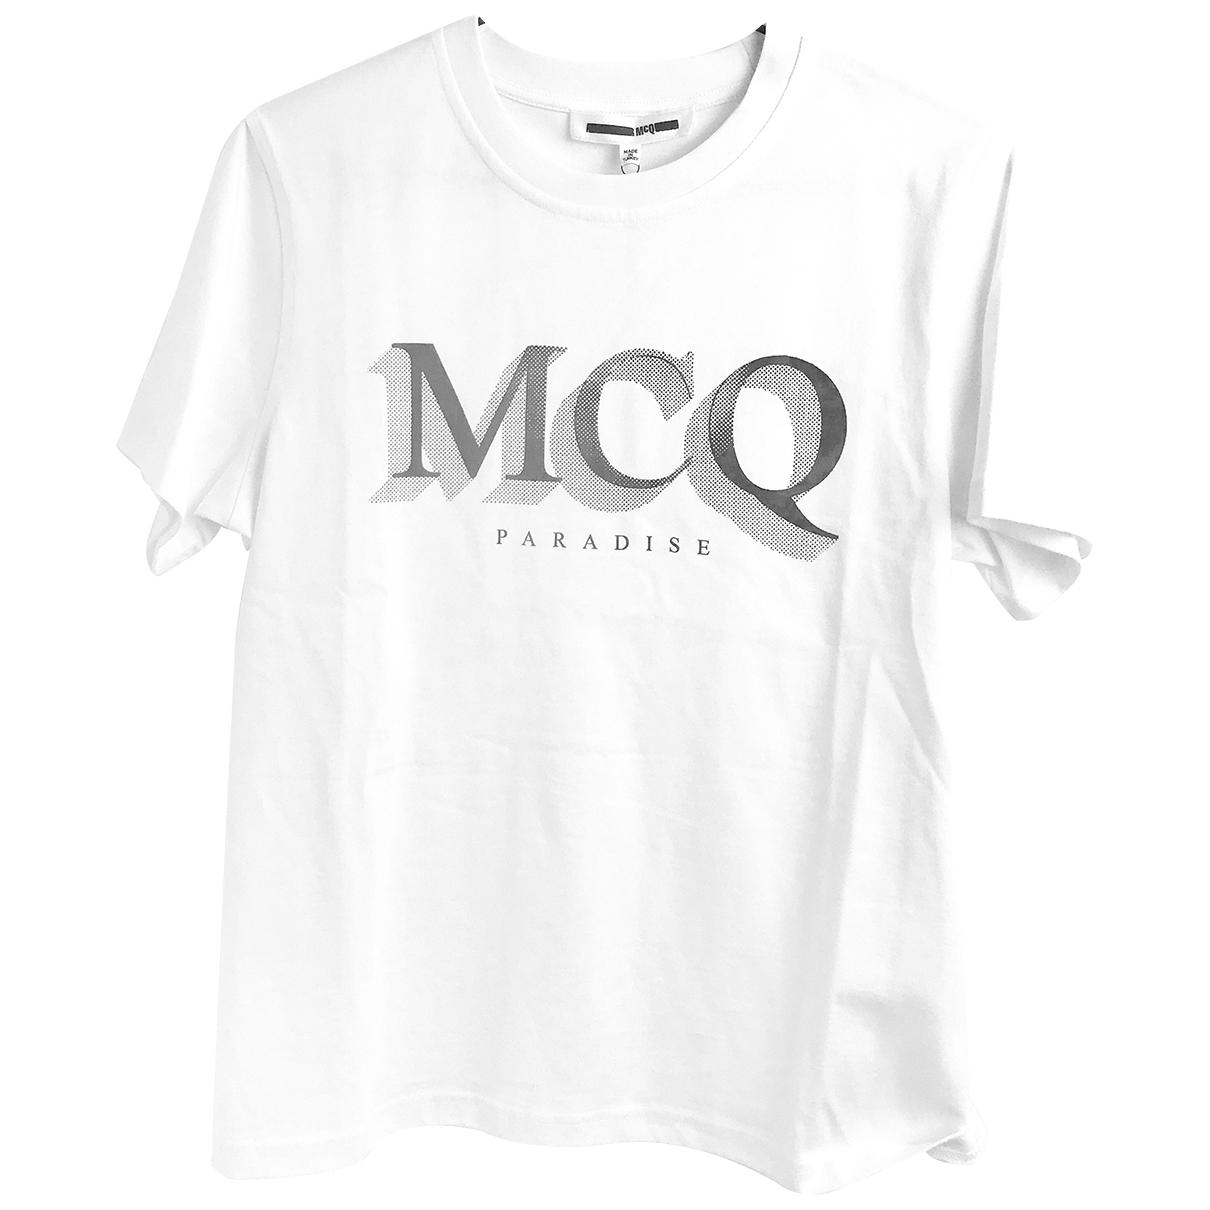 Mcq \N White Cotton  top for Women S International